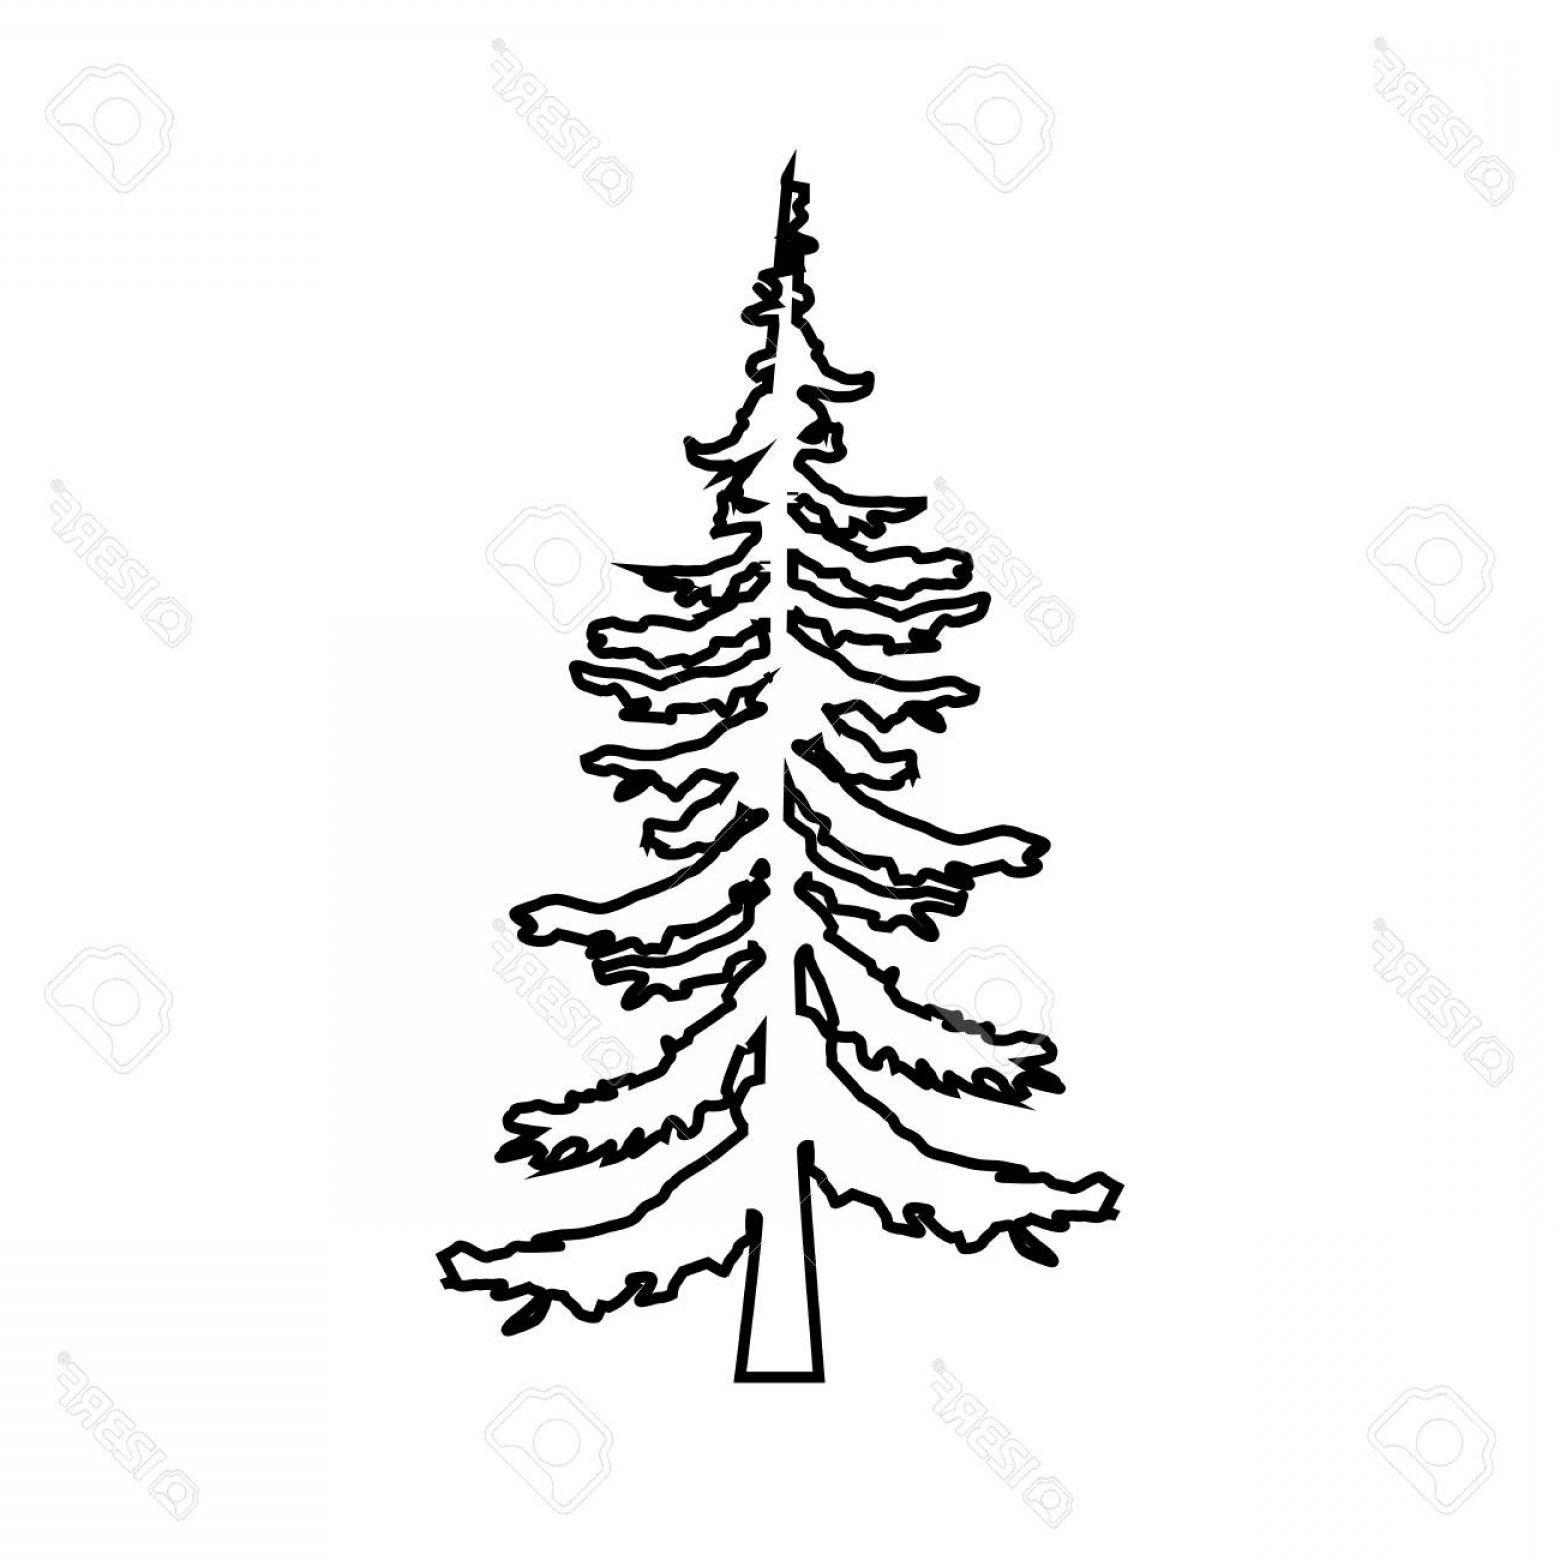 Evergreen Tree Outline Vector Photostock Vector Fir Tree Pine Tree Line Icon Ou Evergreen Fir Icon Line In 2020 Tree Outline Pine Tree Drawing Evergreen Trees